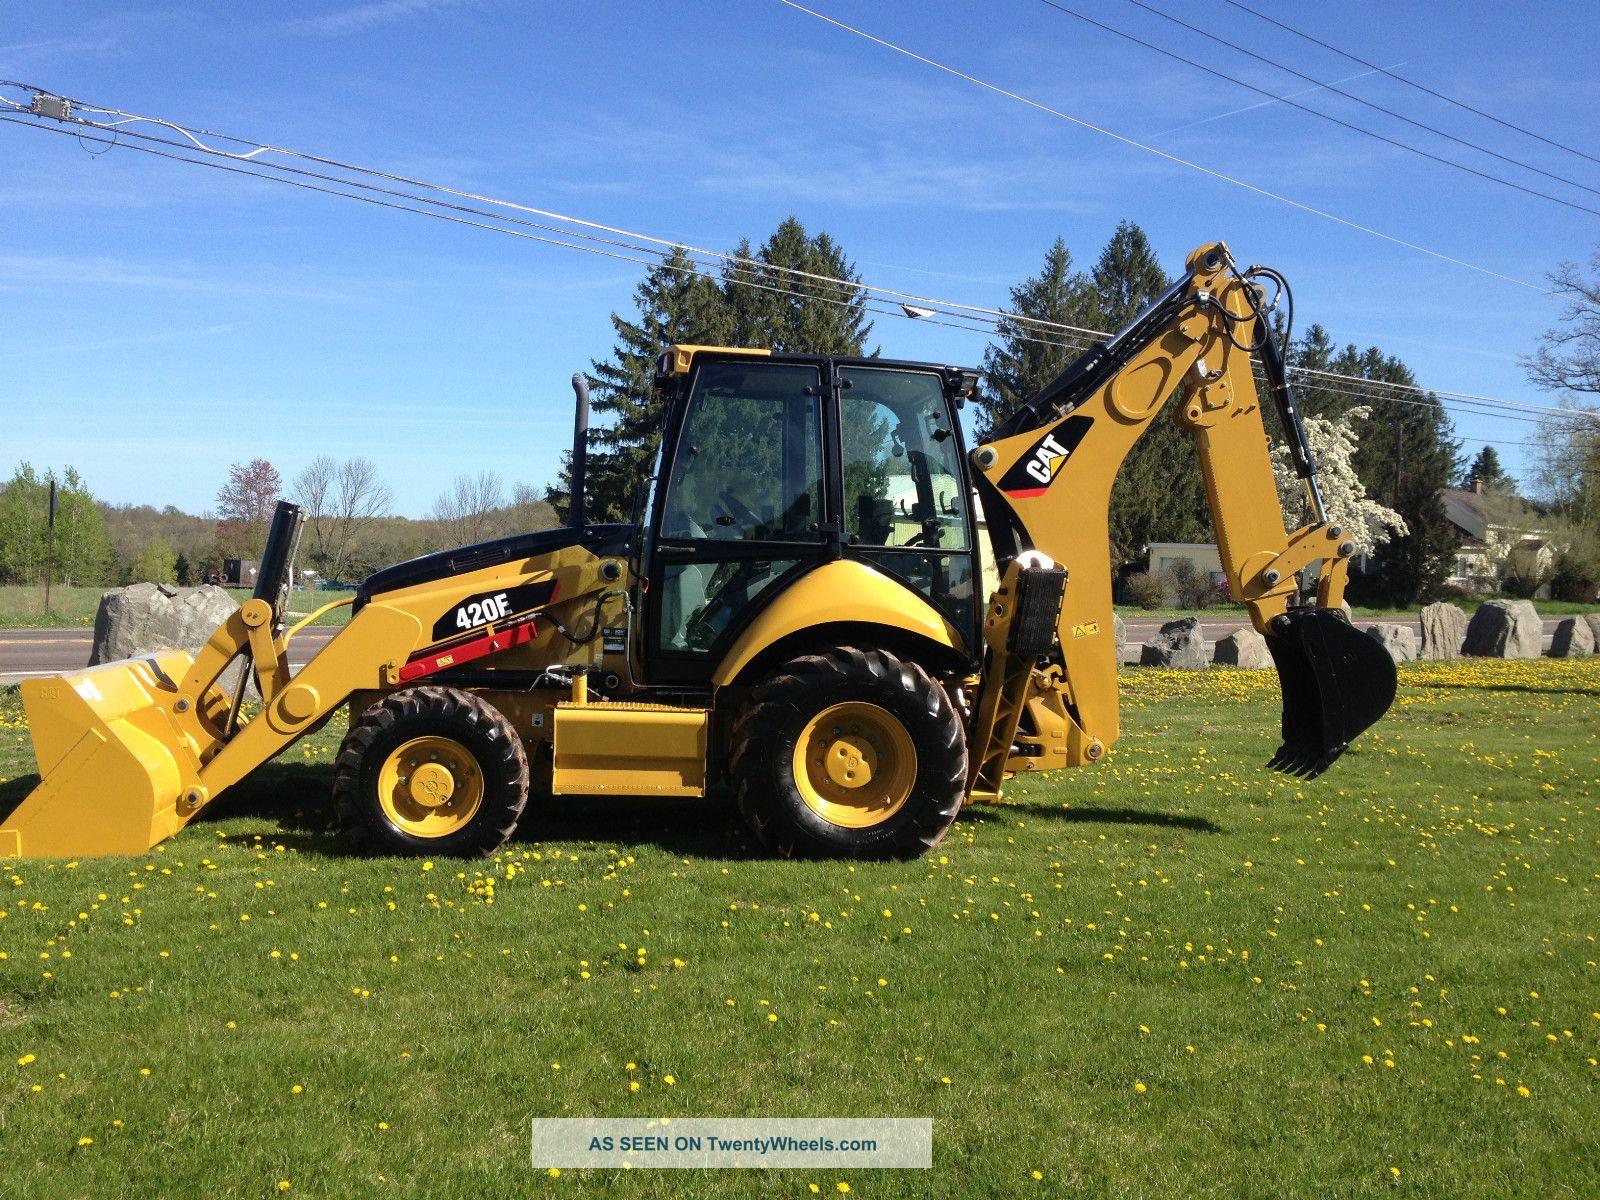 Tractor Loader Backhoe : Caterpillar backhoe images reverse search